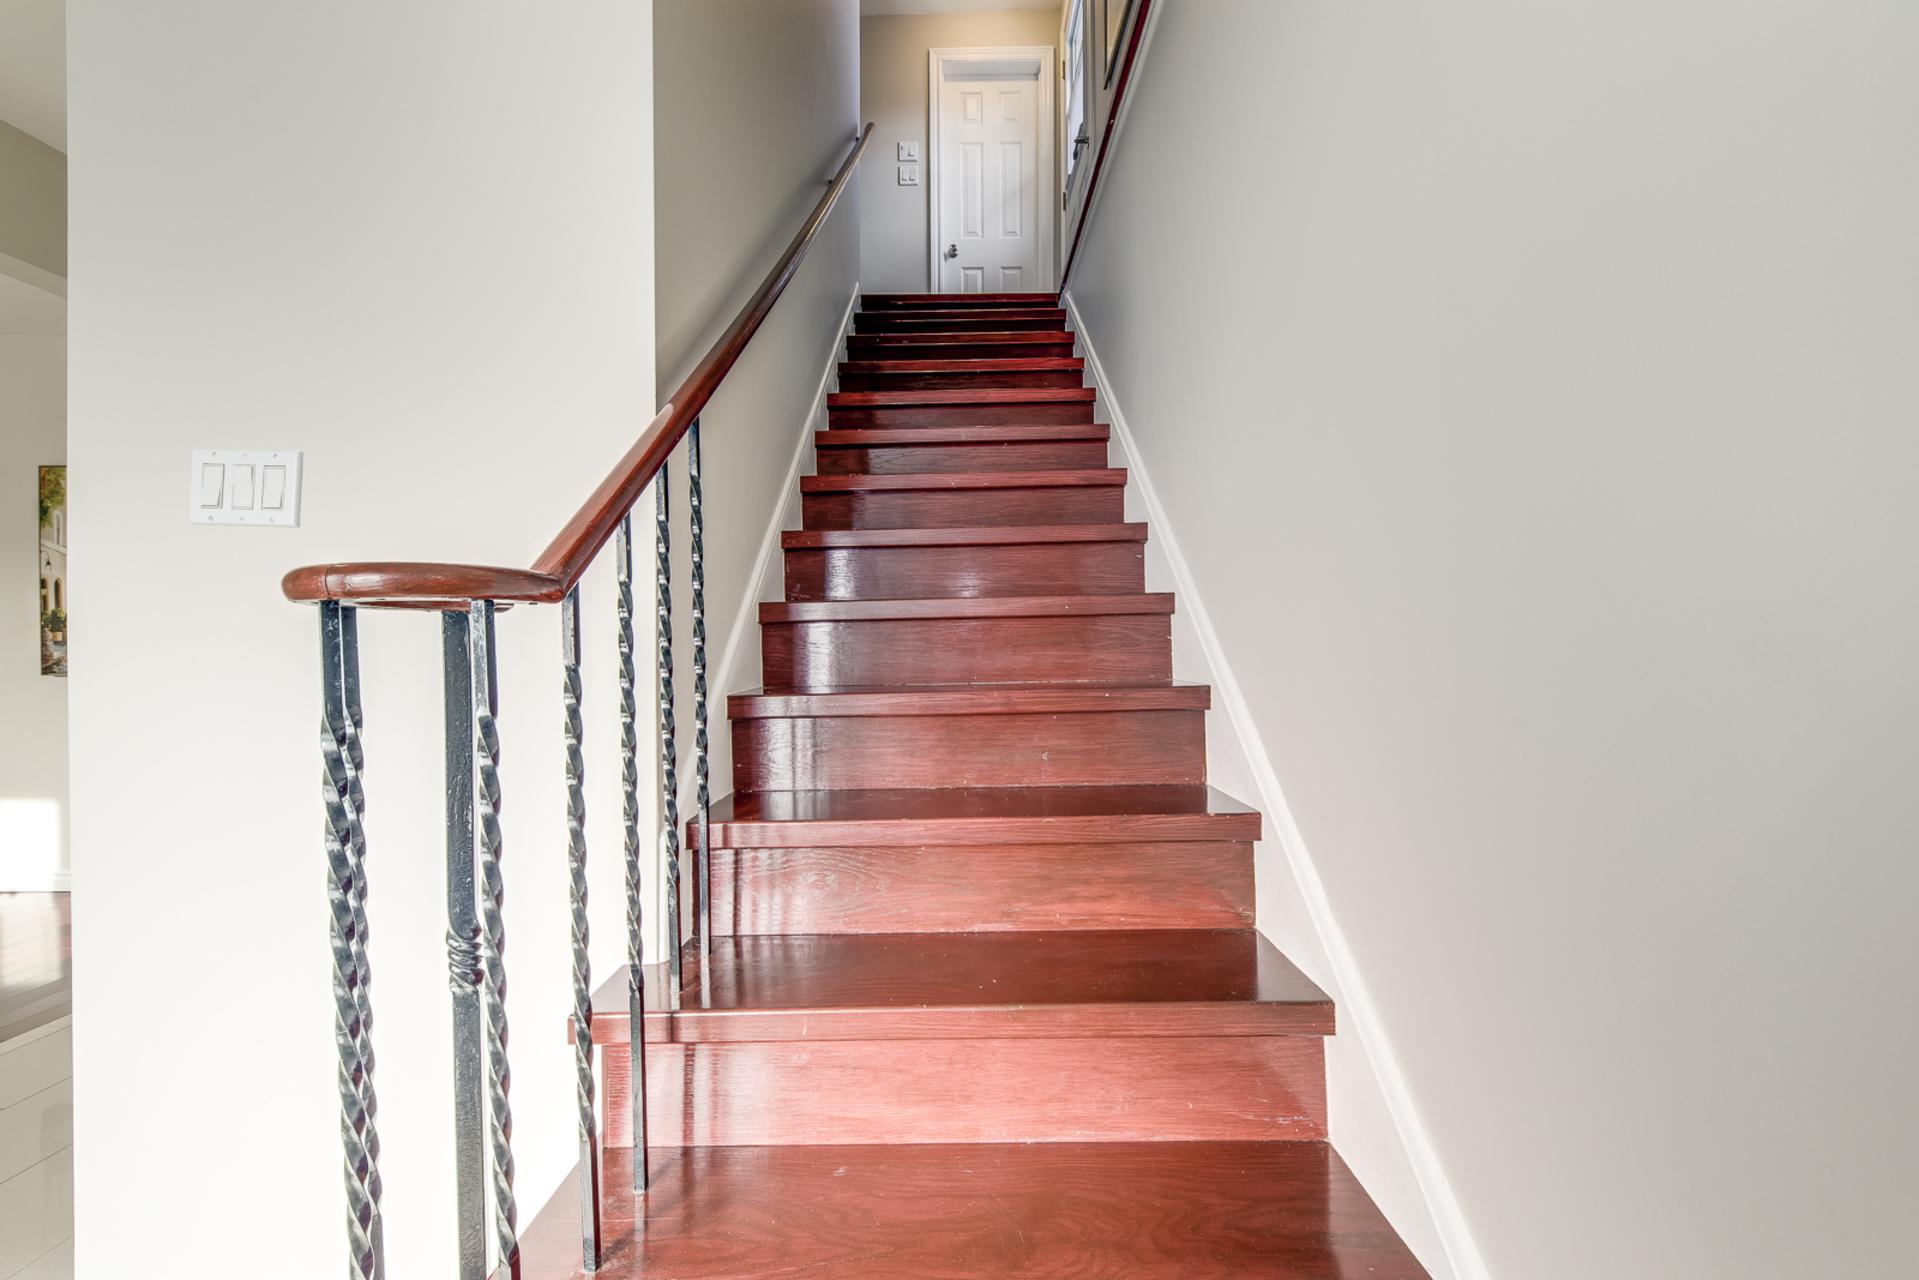 Stairs - 1059 Flagship Dr, Mississauga - Elite3 & Team at 1059 Flagship Drive, Applewood, Mississauga